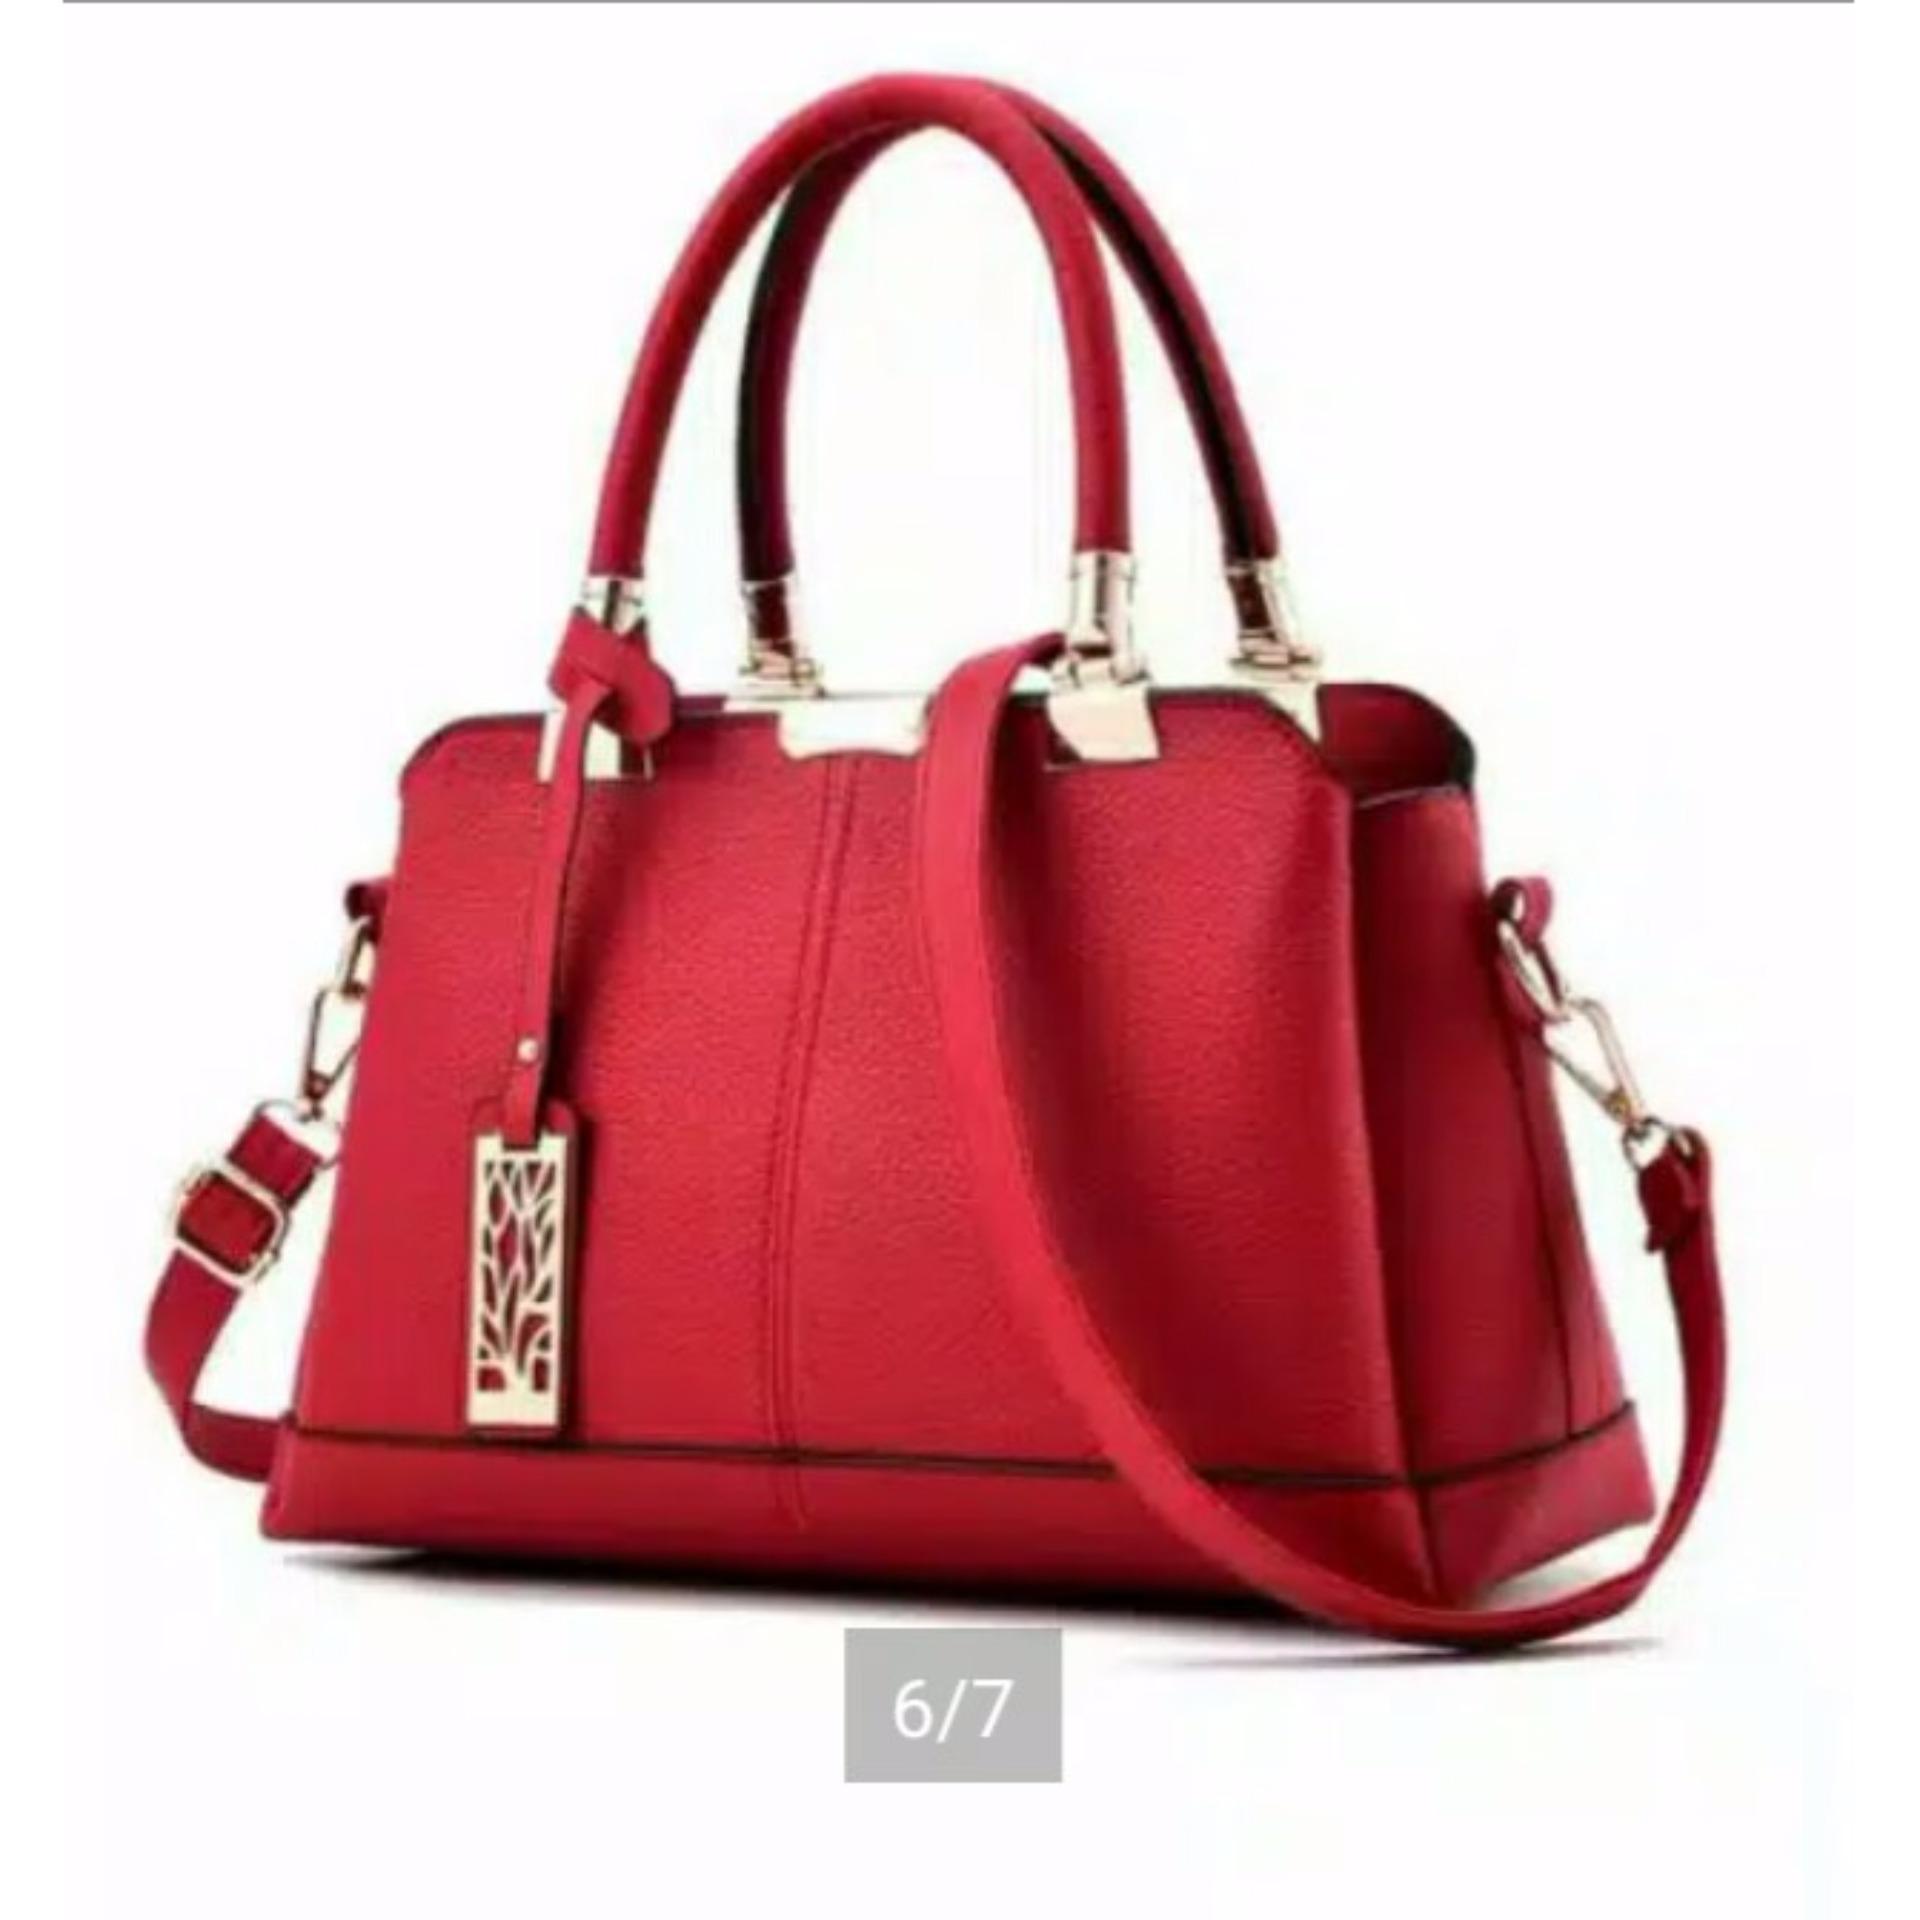 Beli Tas Branded Wanita Btm Fashion Multicolor Online Jawa Barat